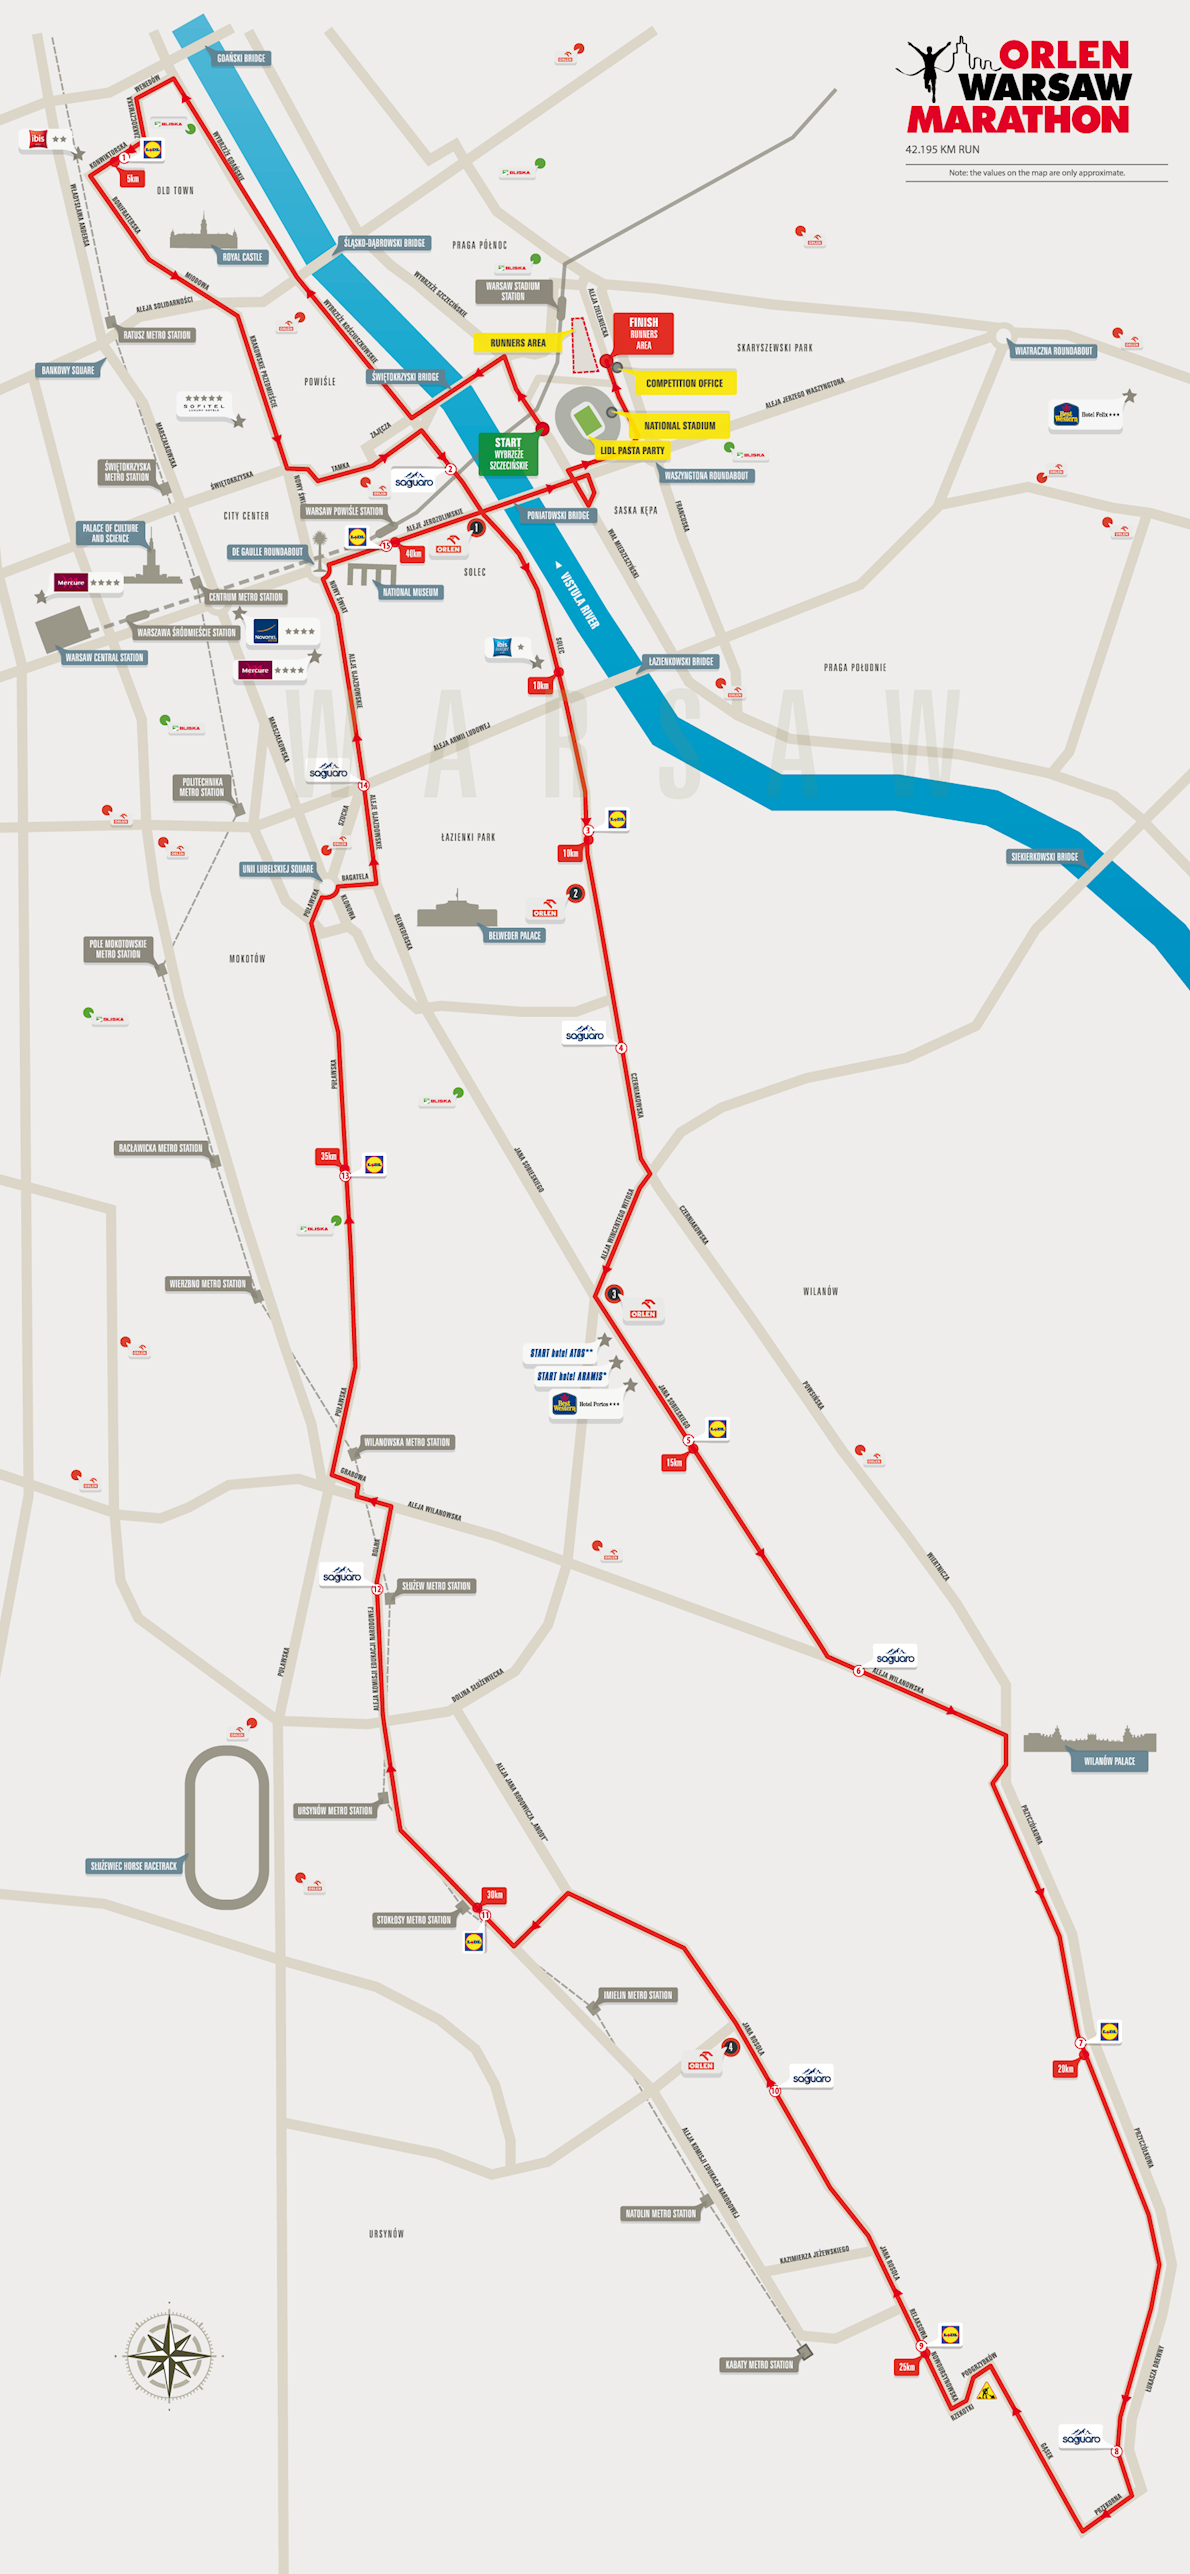 Orlen Warsaw Marathon Mappa del percorso